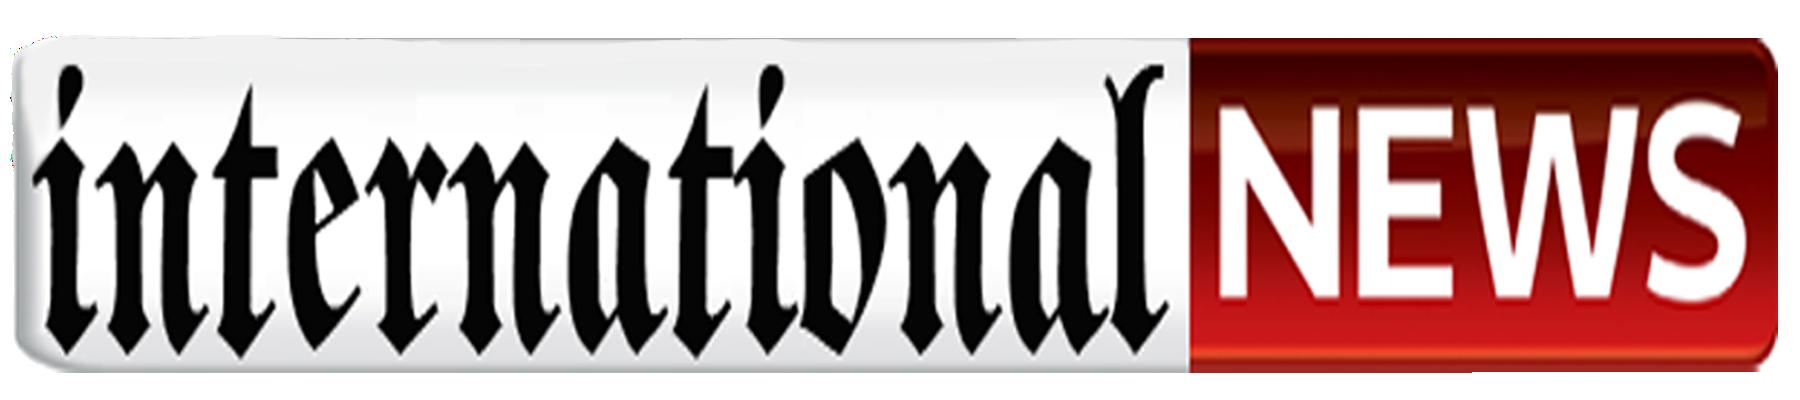 internationalnews - l'actualité internationale